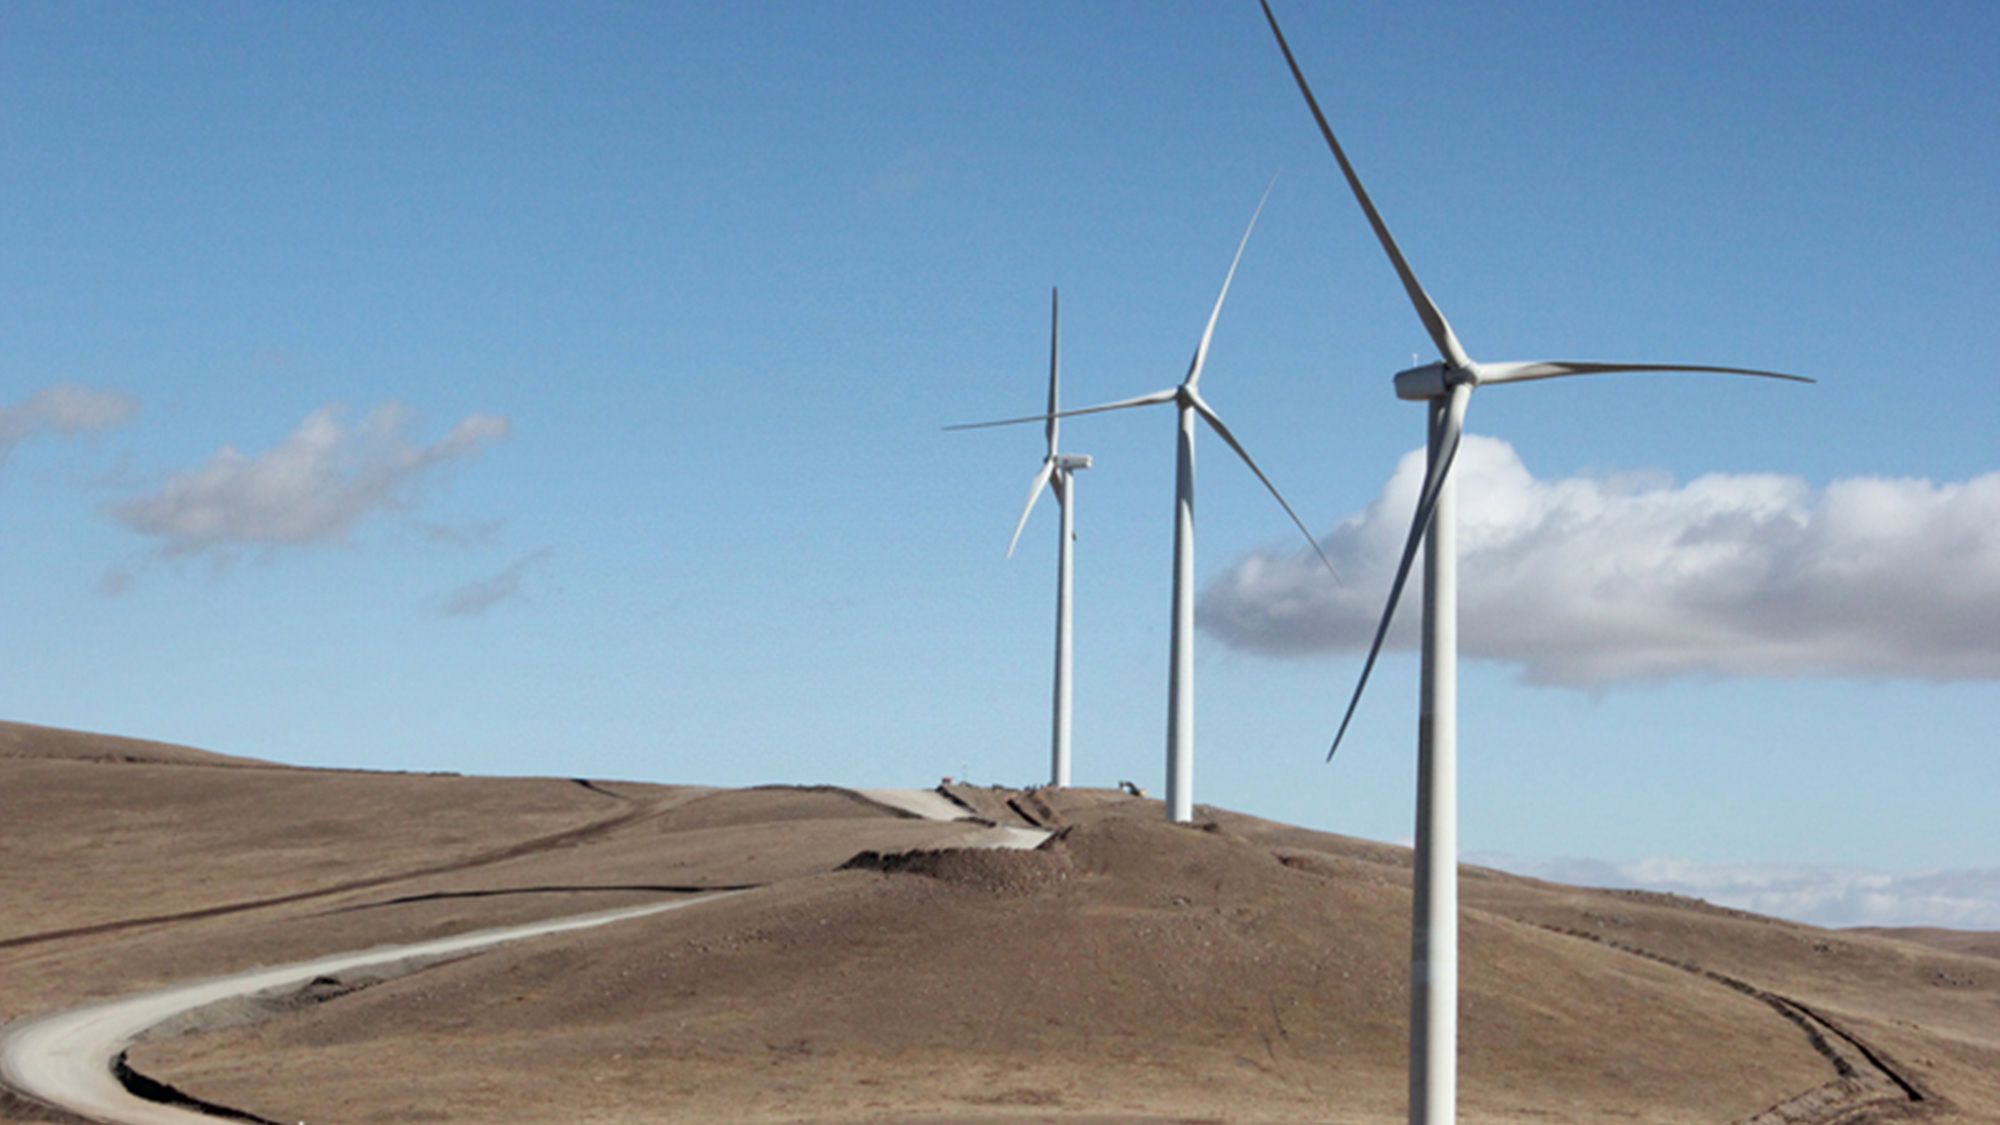 salkhit-wind-farm-image-1